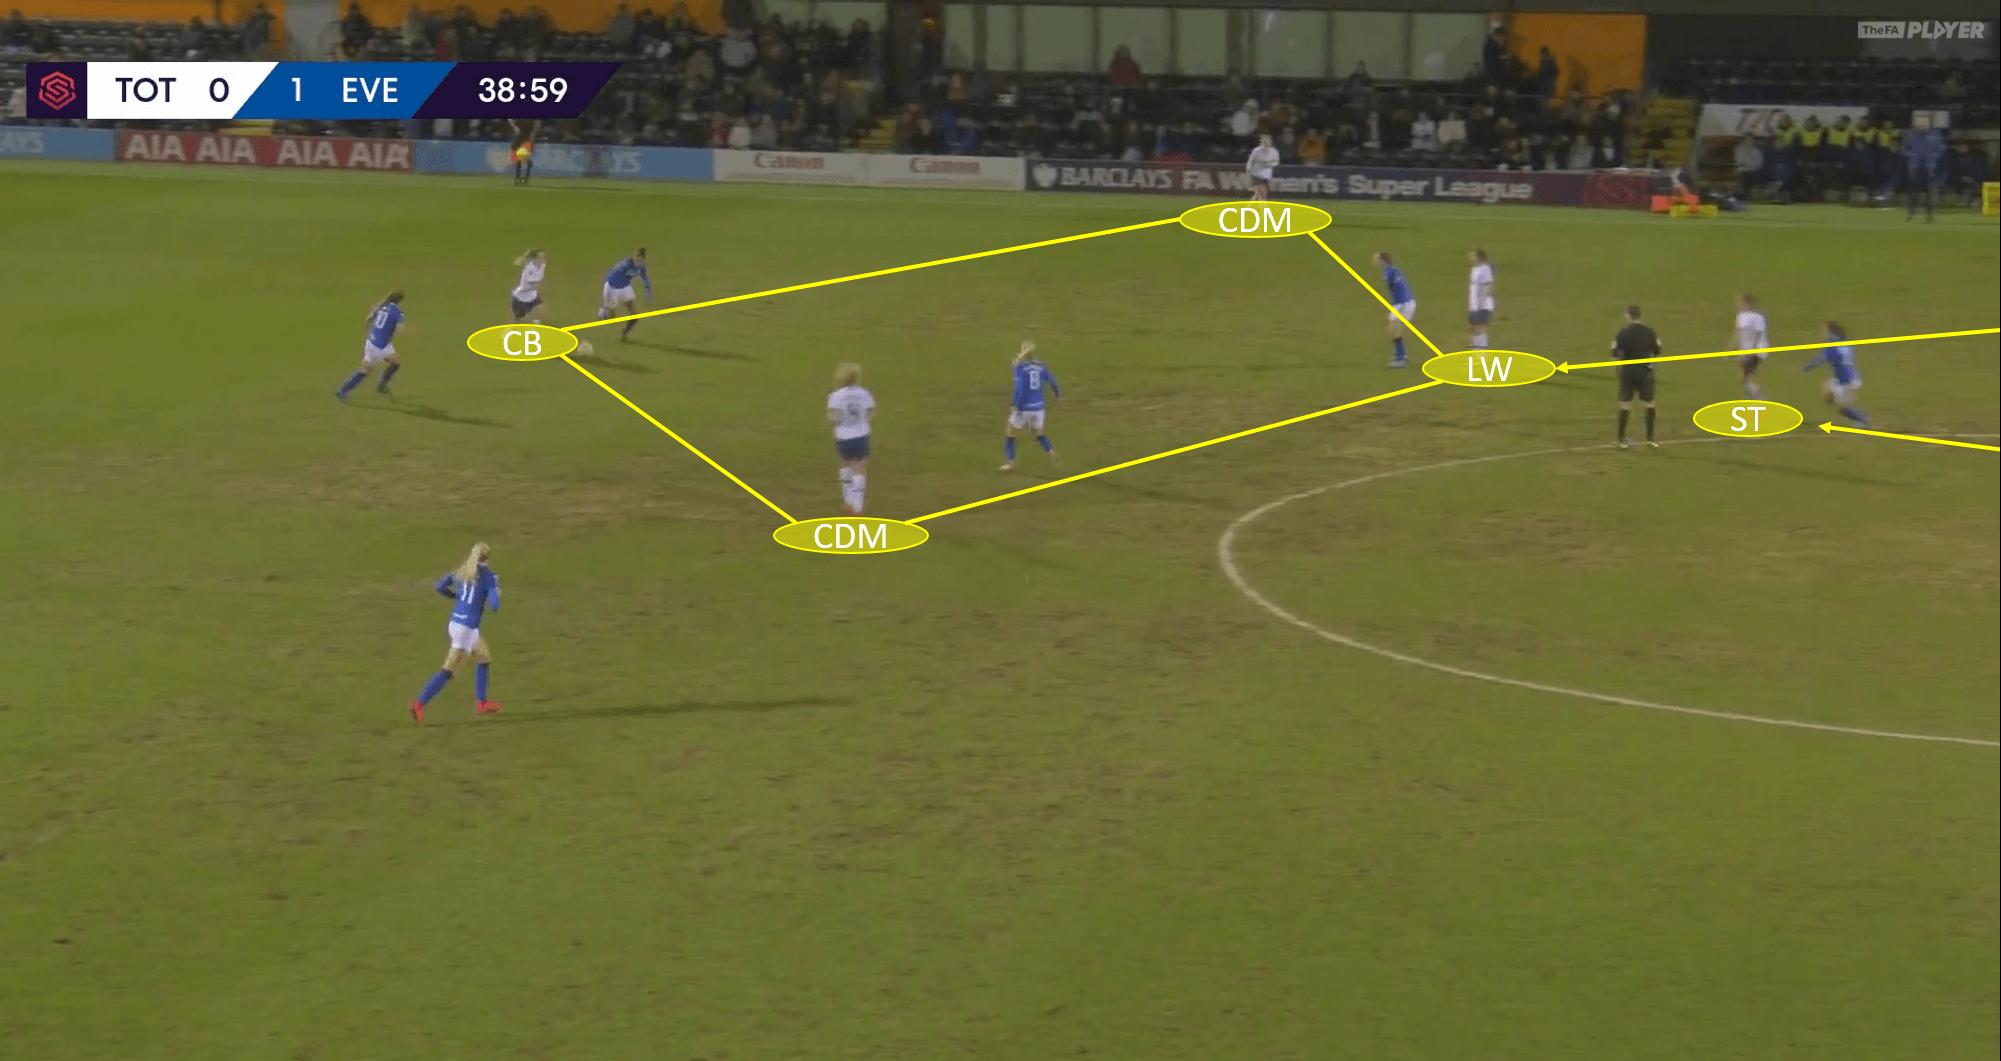 FFAWSL 2019/20: Tottenham Women vs Everton Women - tactical analysis tacticsAWSL 2019/20: Tottenham Women vs Everton Women - tactical analysis tactics